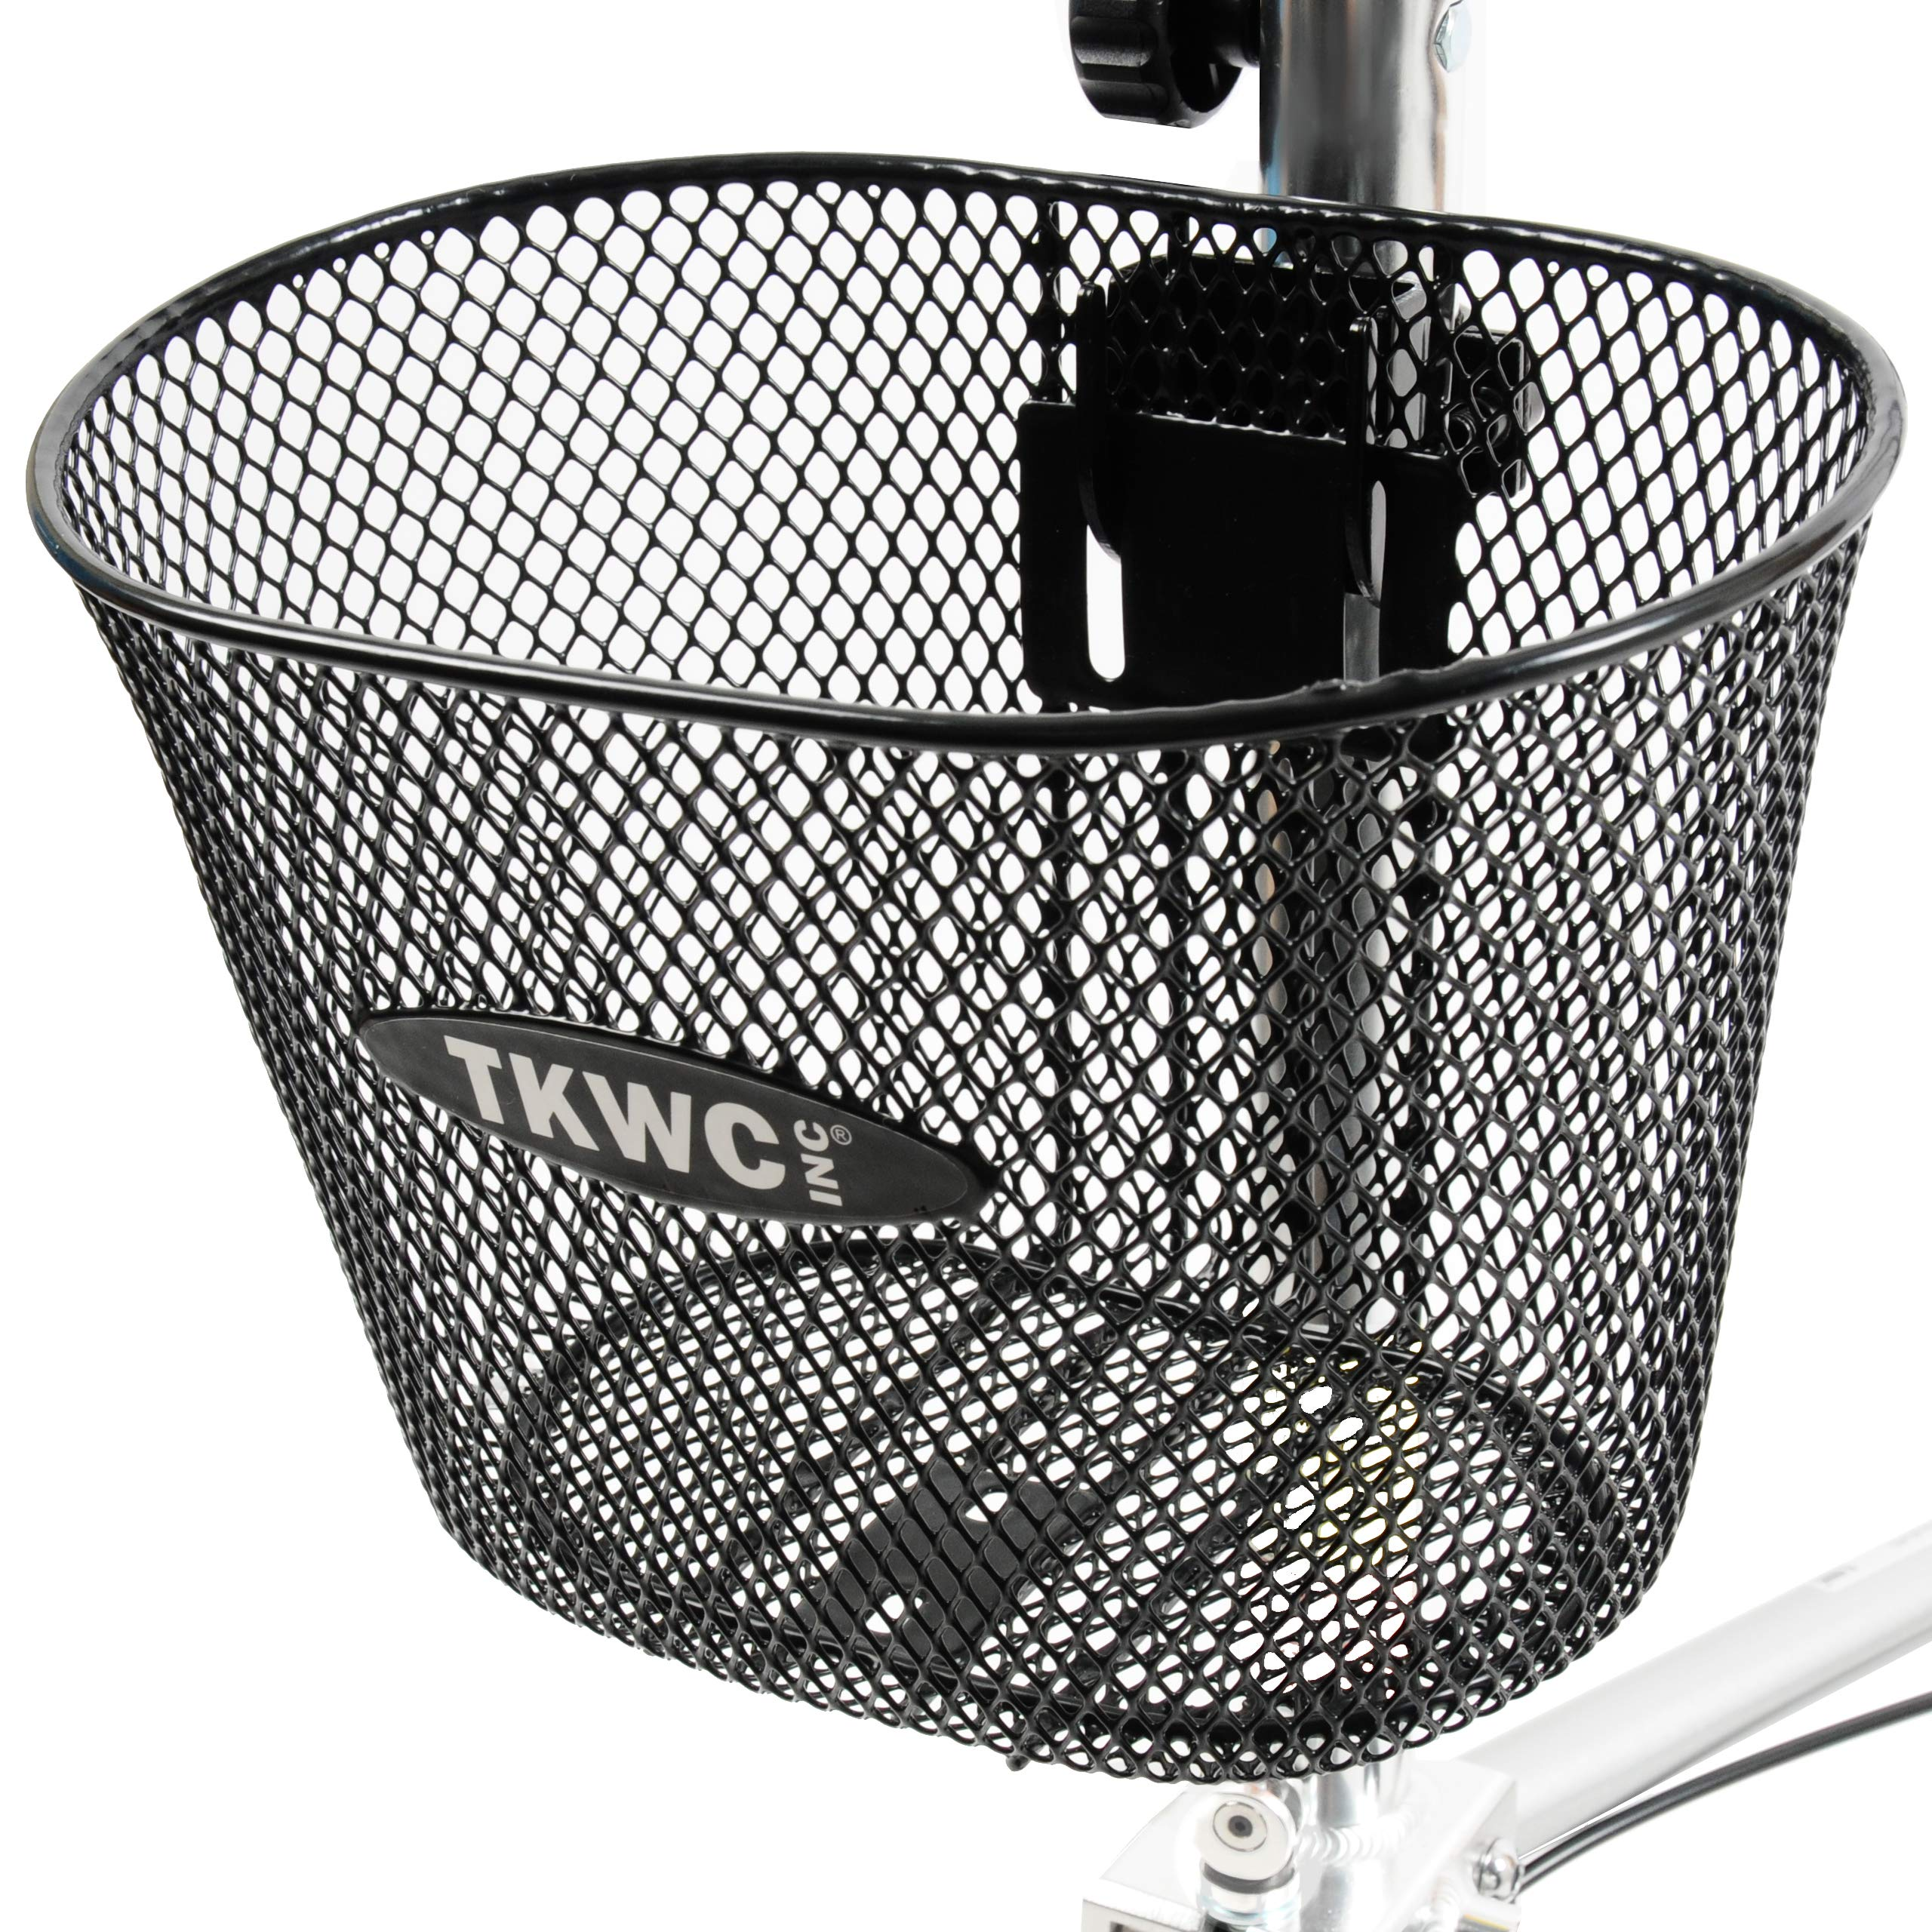 Knee Scooter Basket Accessory by TKWC INC - Universal Bracket Mount Included! - Fits Most Knee Walker Models by TKWC INC